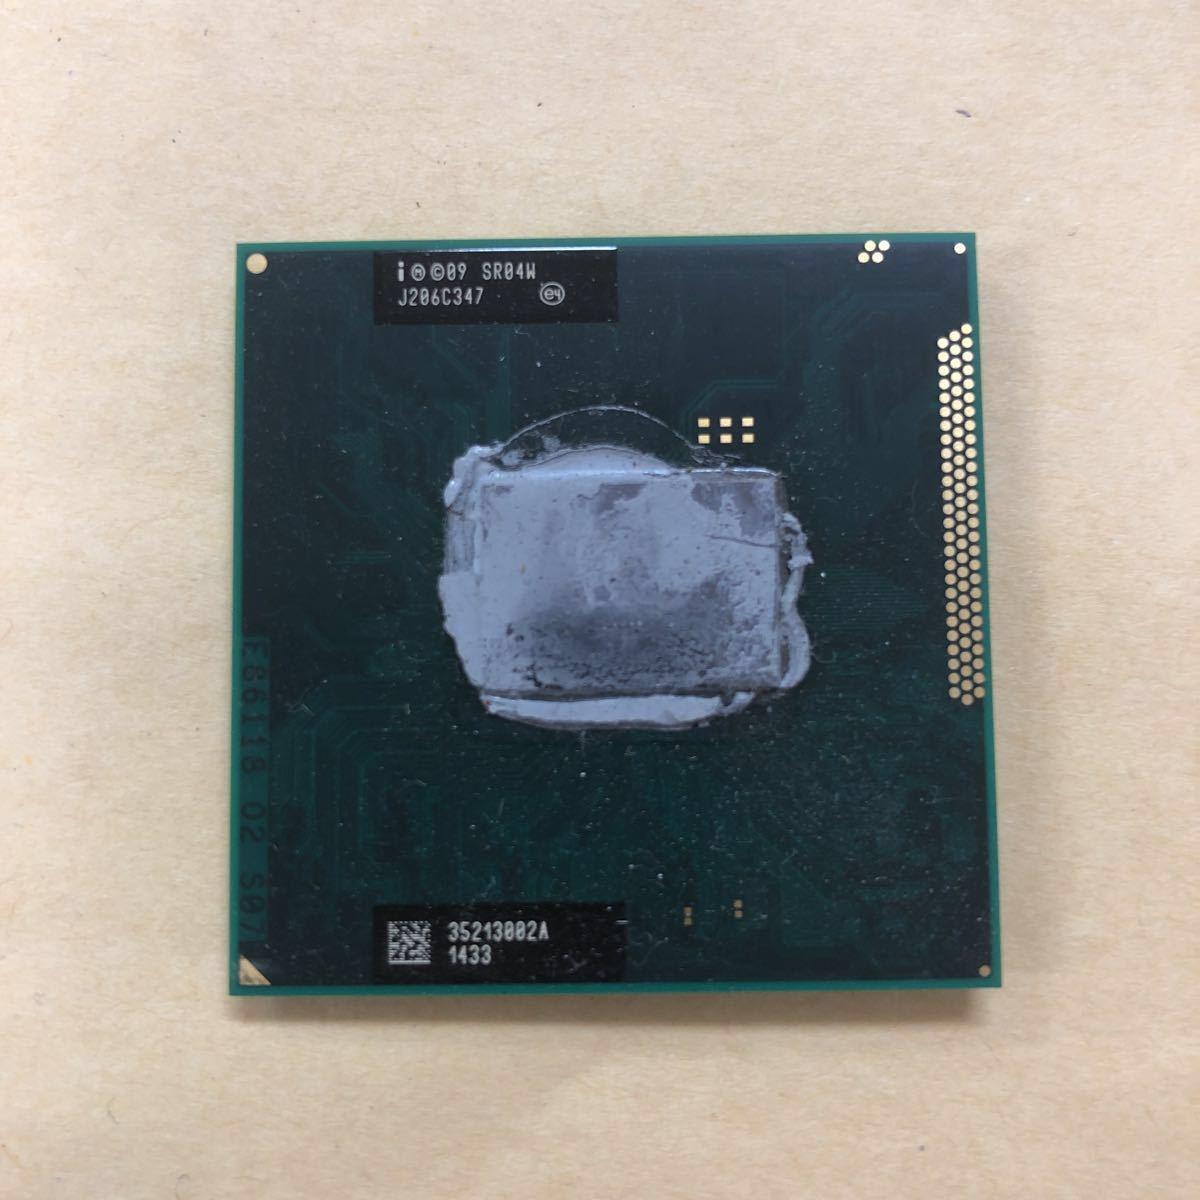 INTEL Core i5 SR04W / SR0CH 2枚せット ノ一ト用